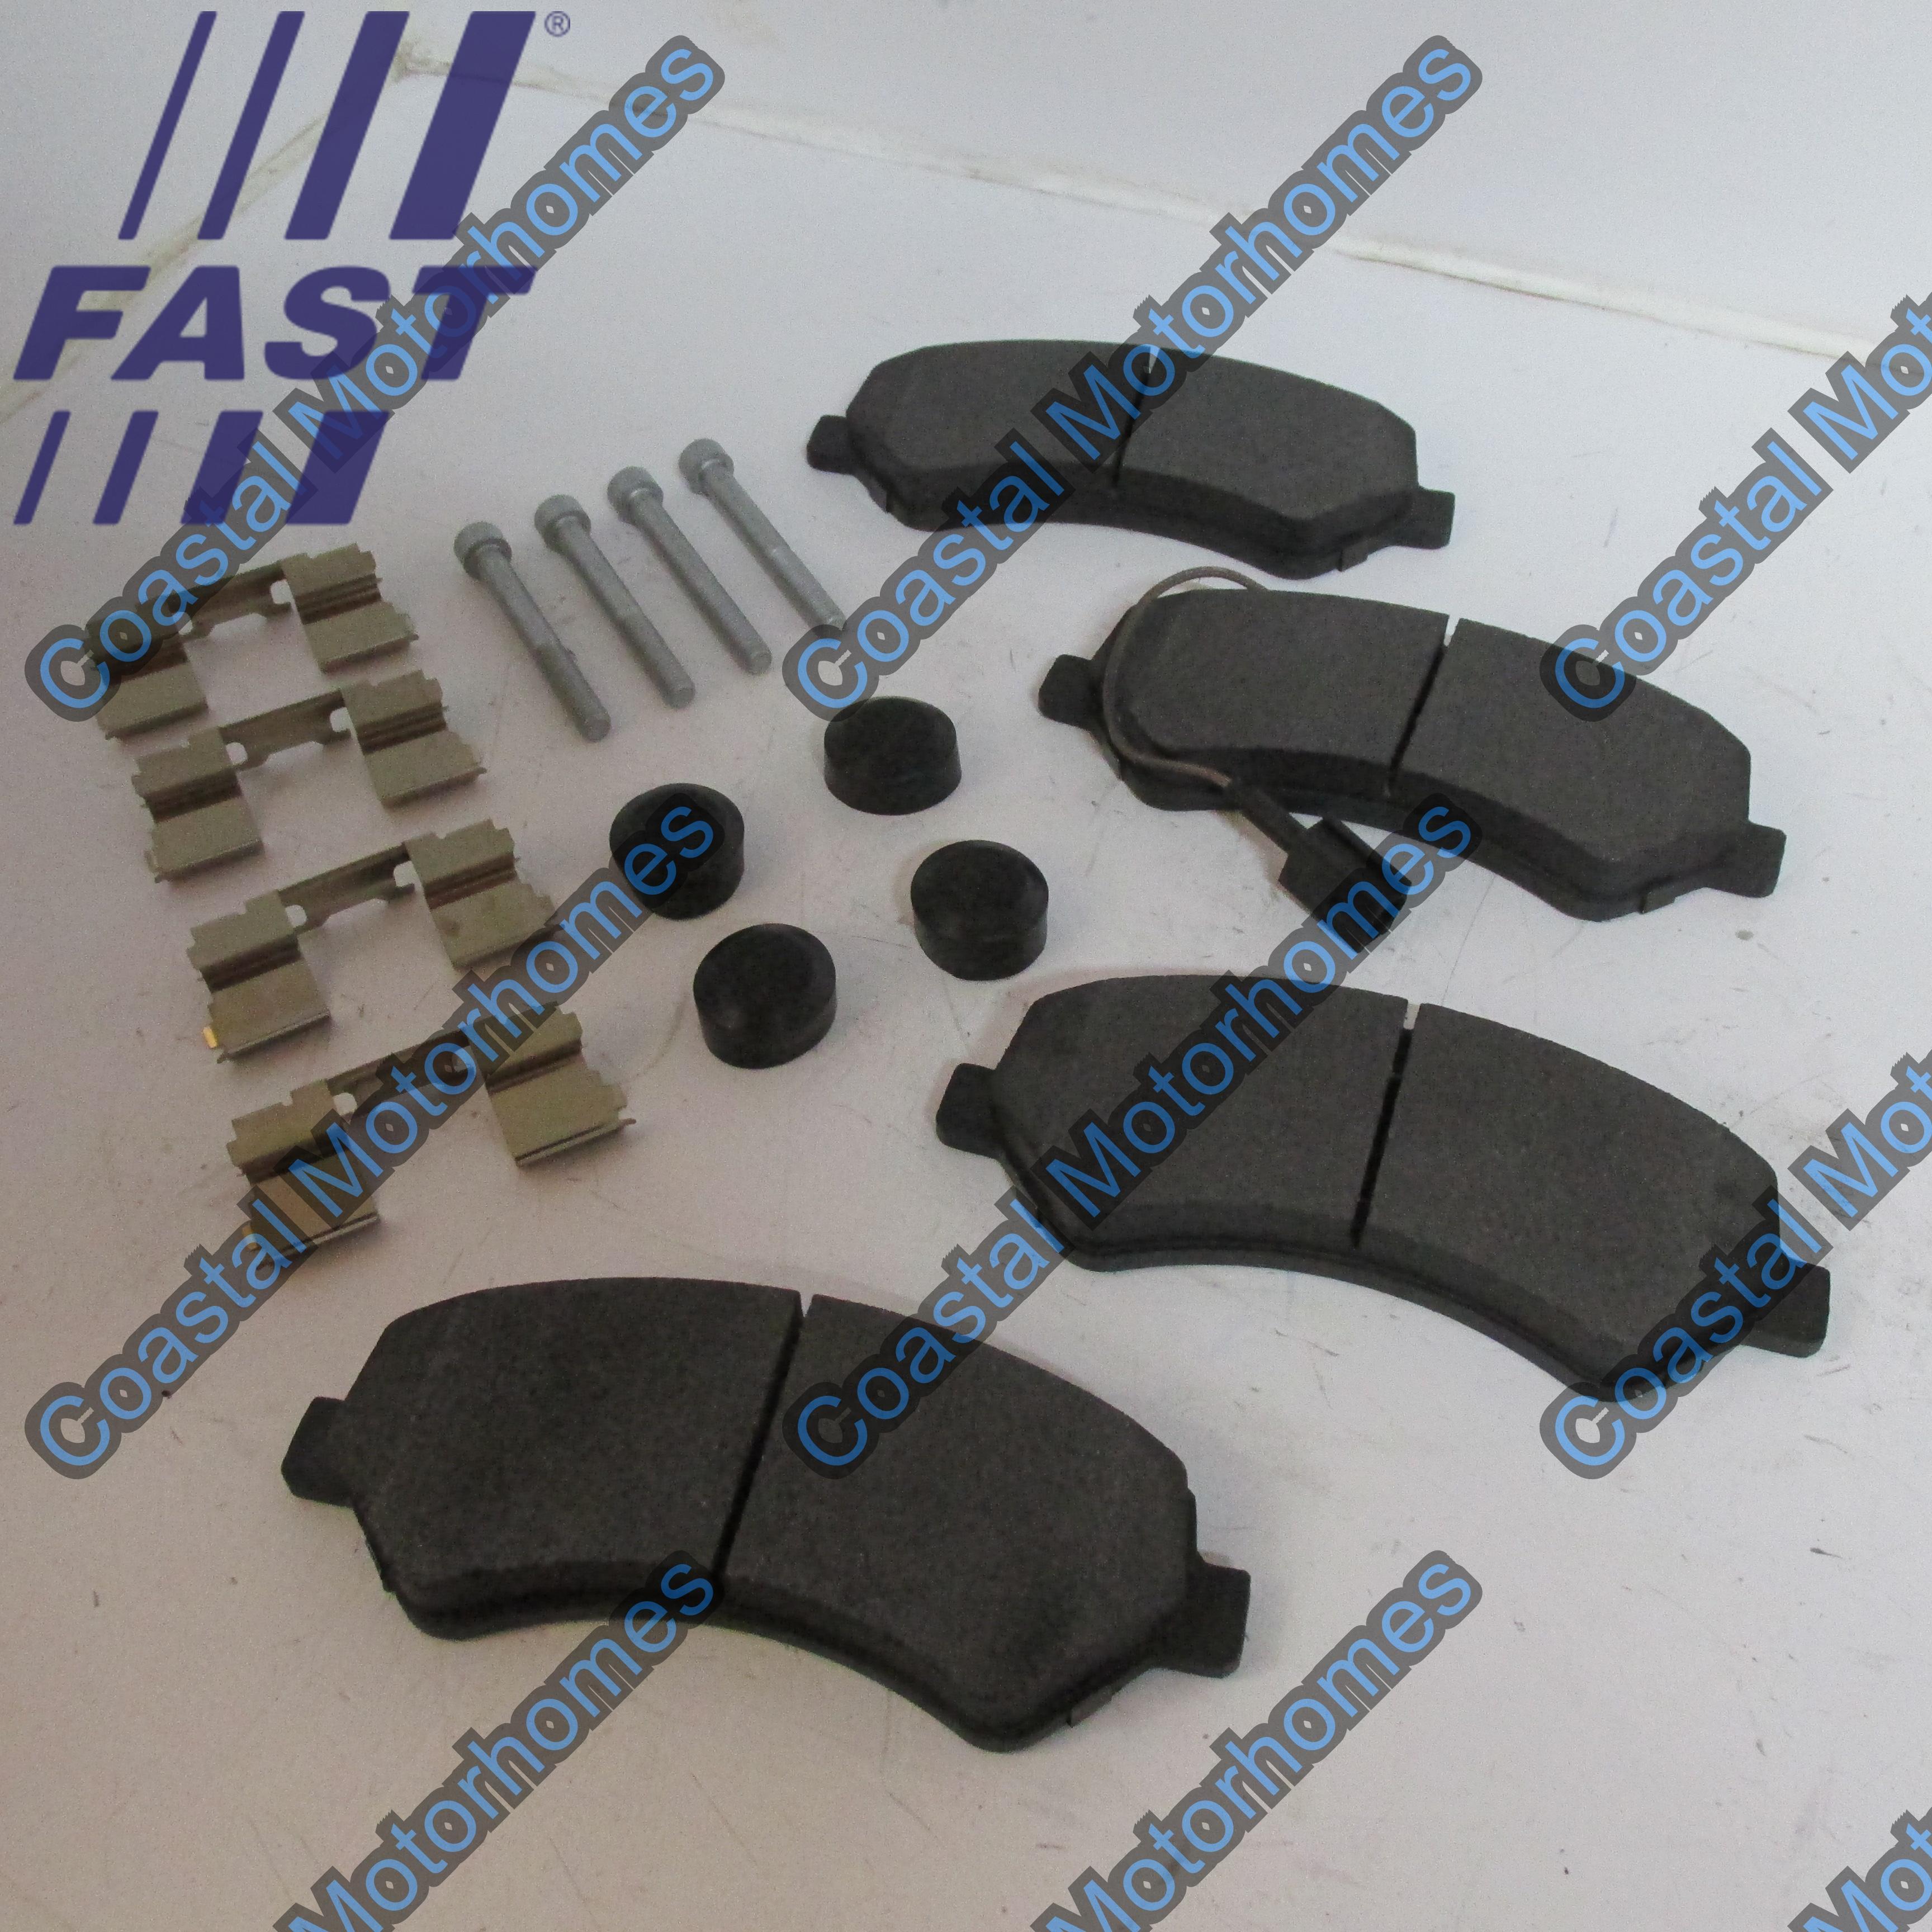 Fiat Ducato Peugeot Boxer Citroen Relay Front Brake Pad Set 77364014